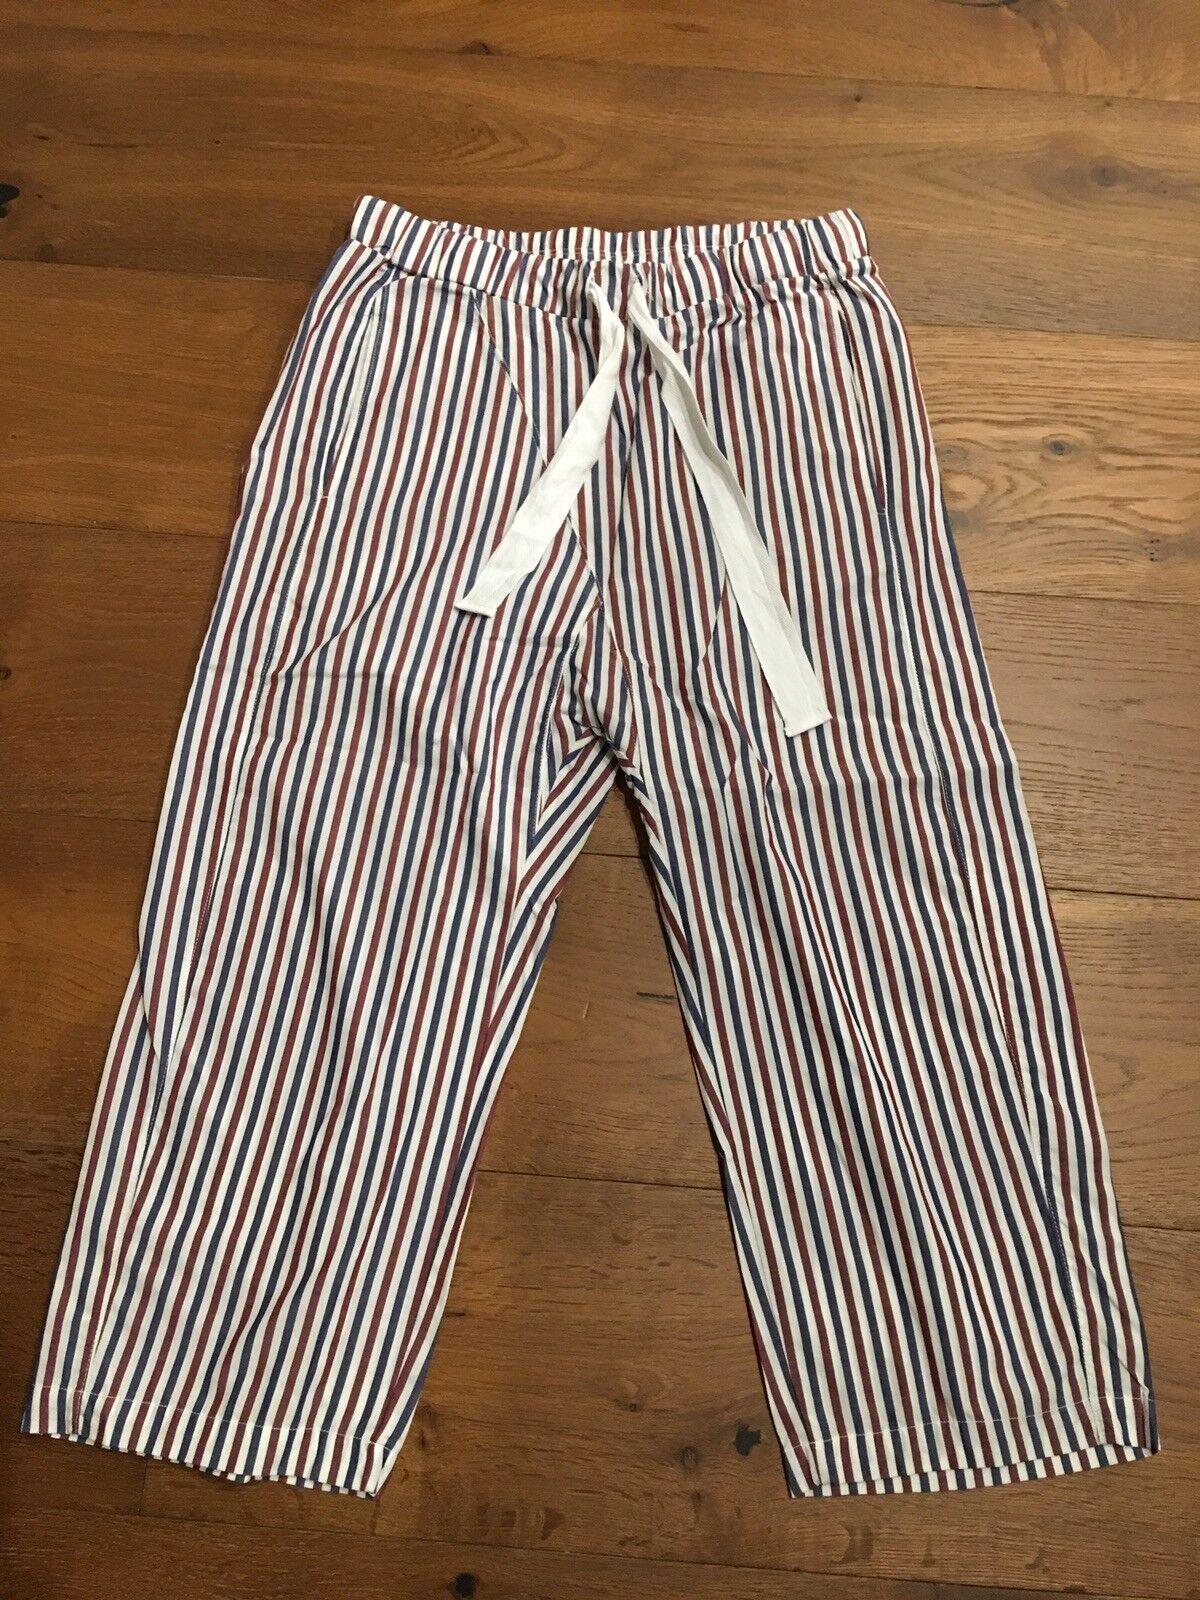 Authentic STATESIDE Wine Navy Stripes Pants Größe XS  149 NWT